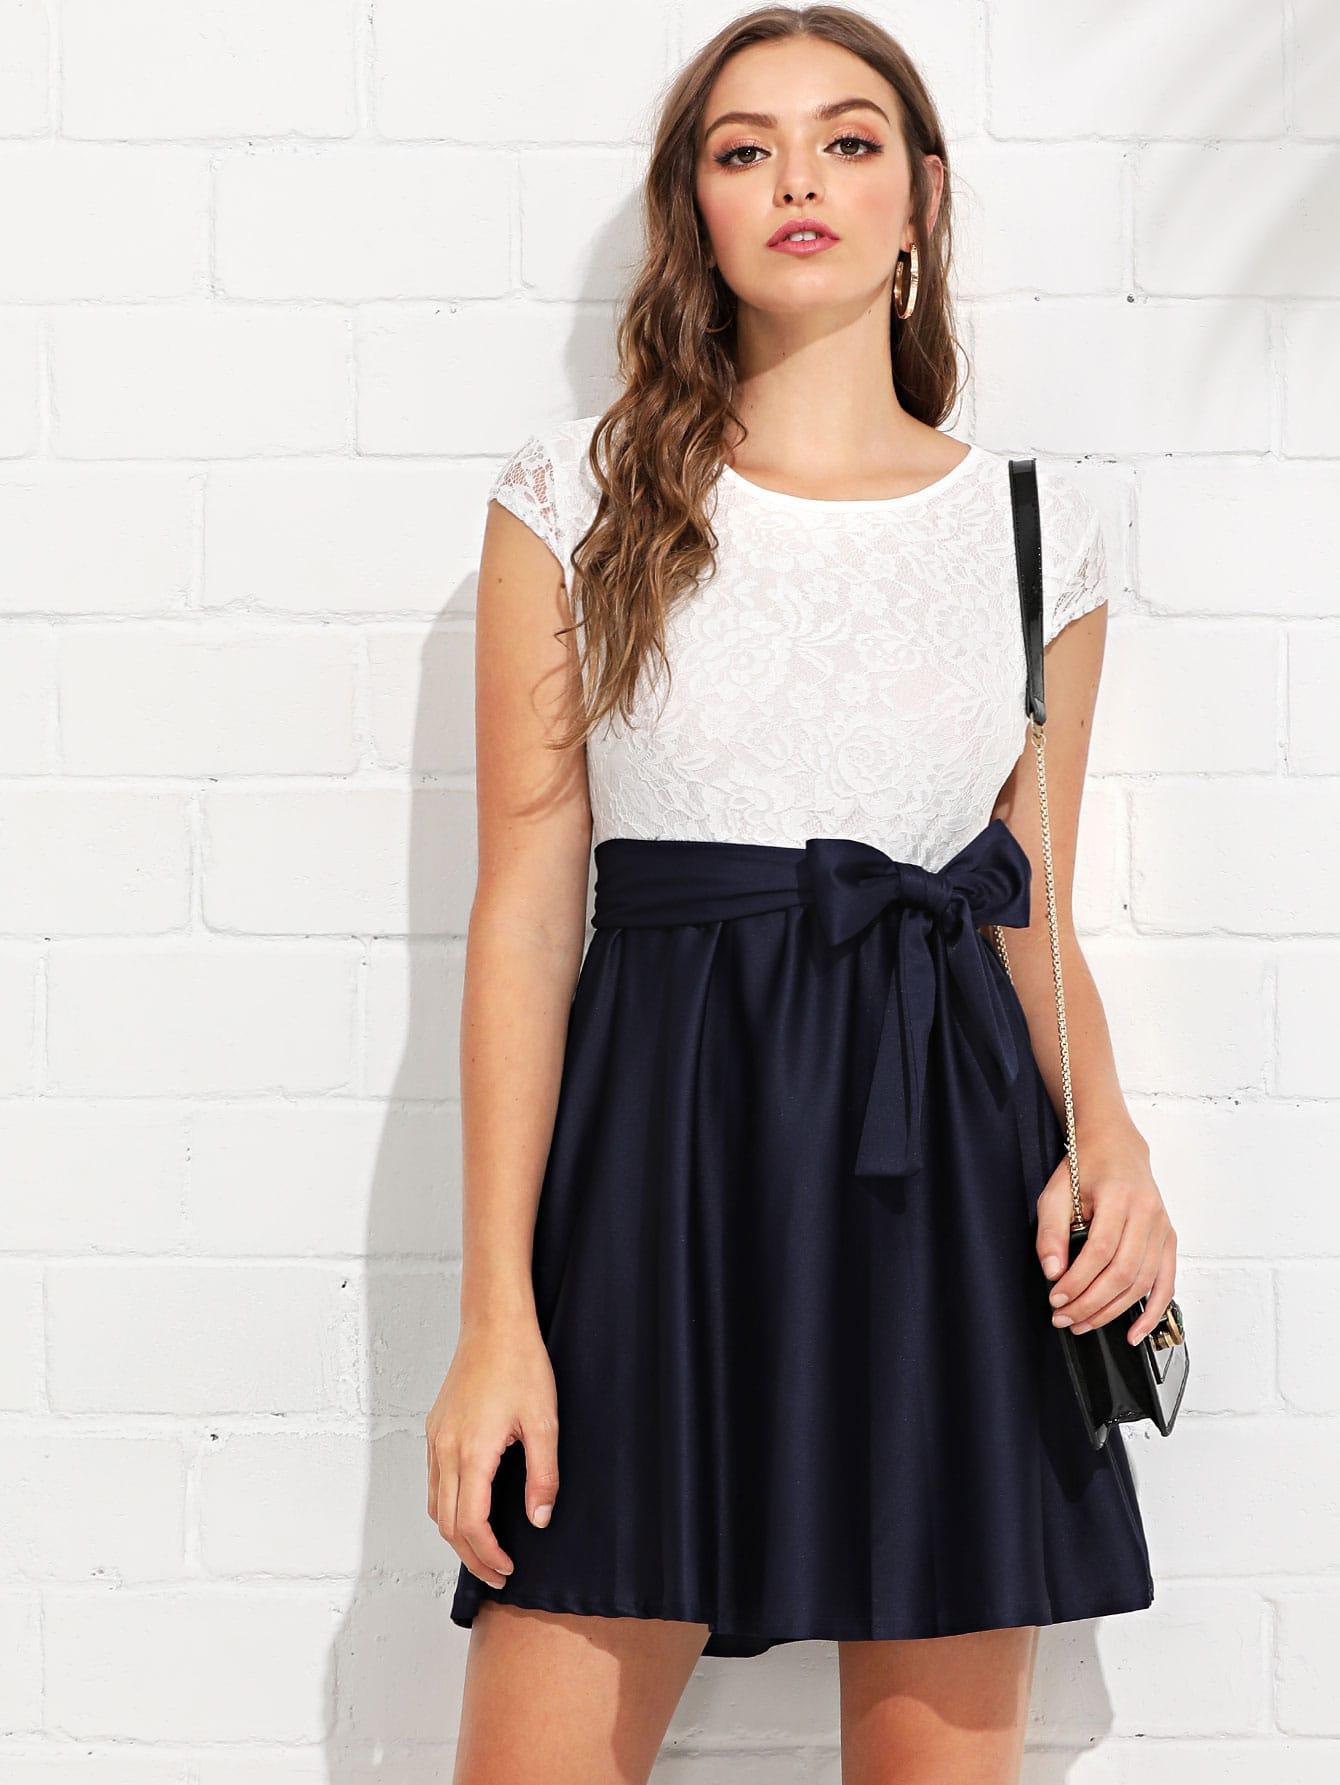 Купить Платье для талии с кружевами, Luiza, SheIn